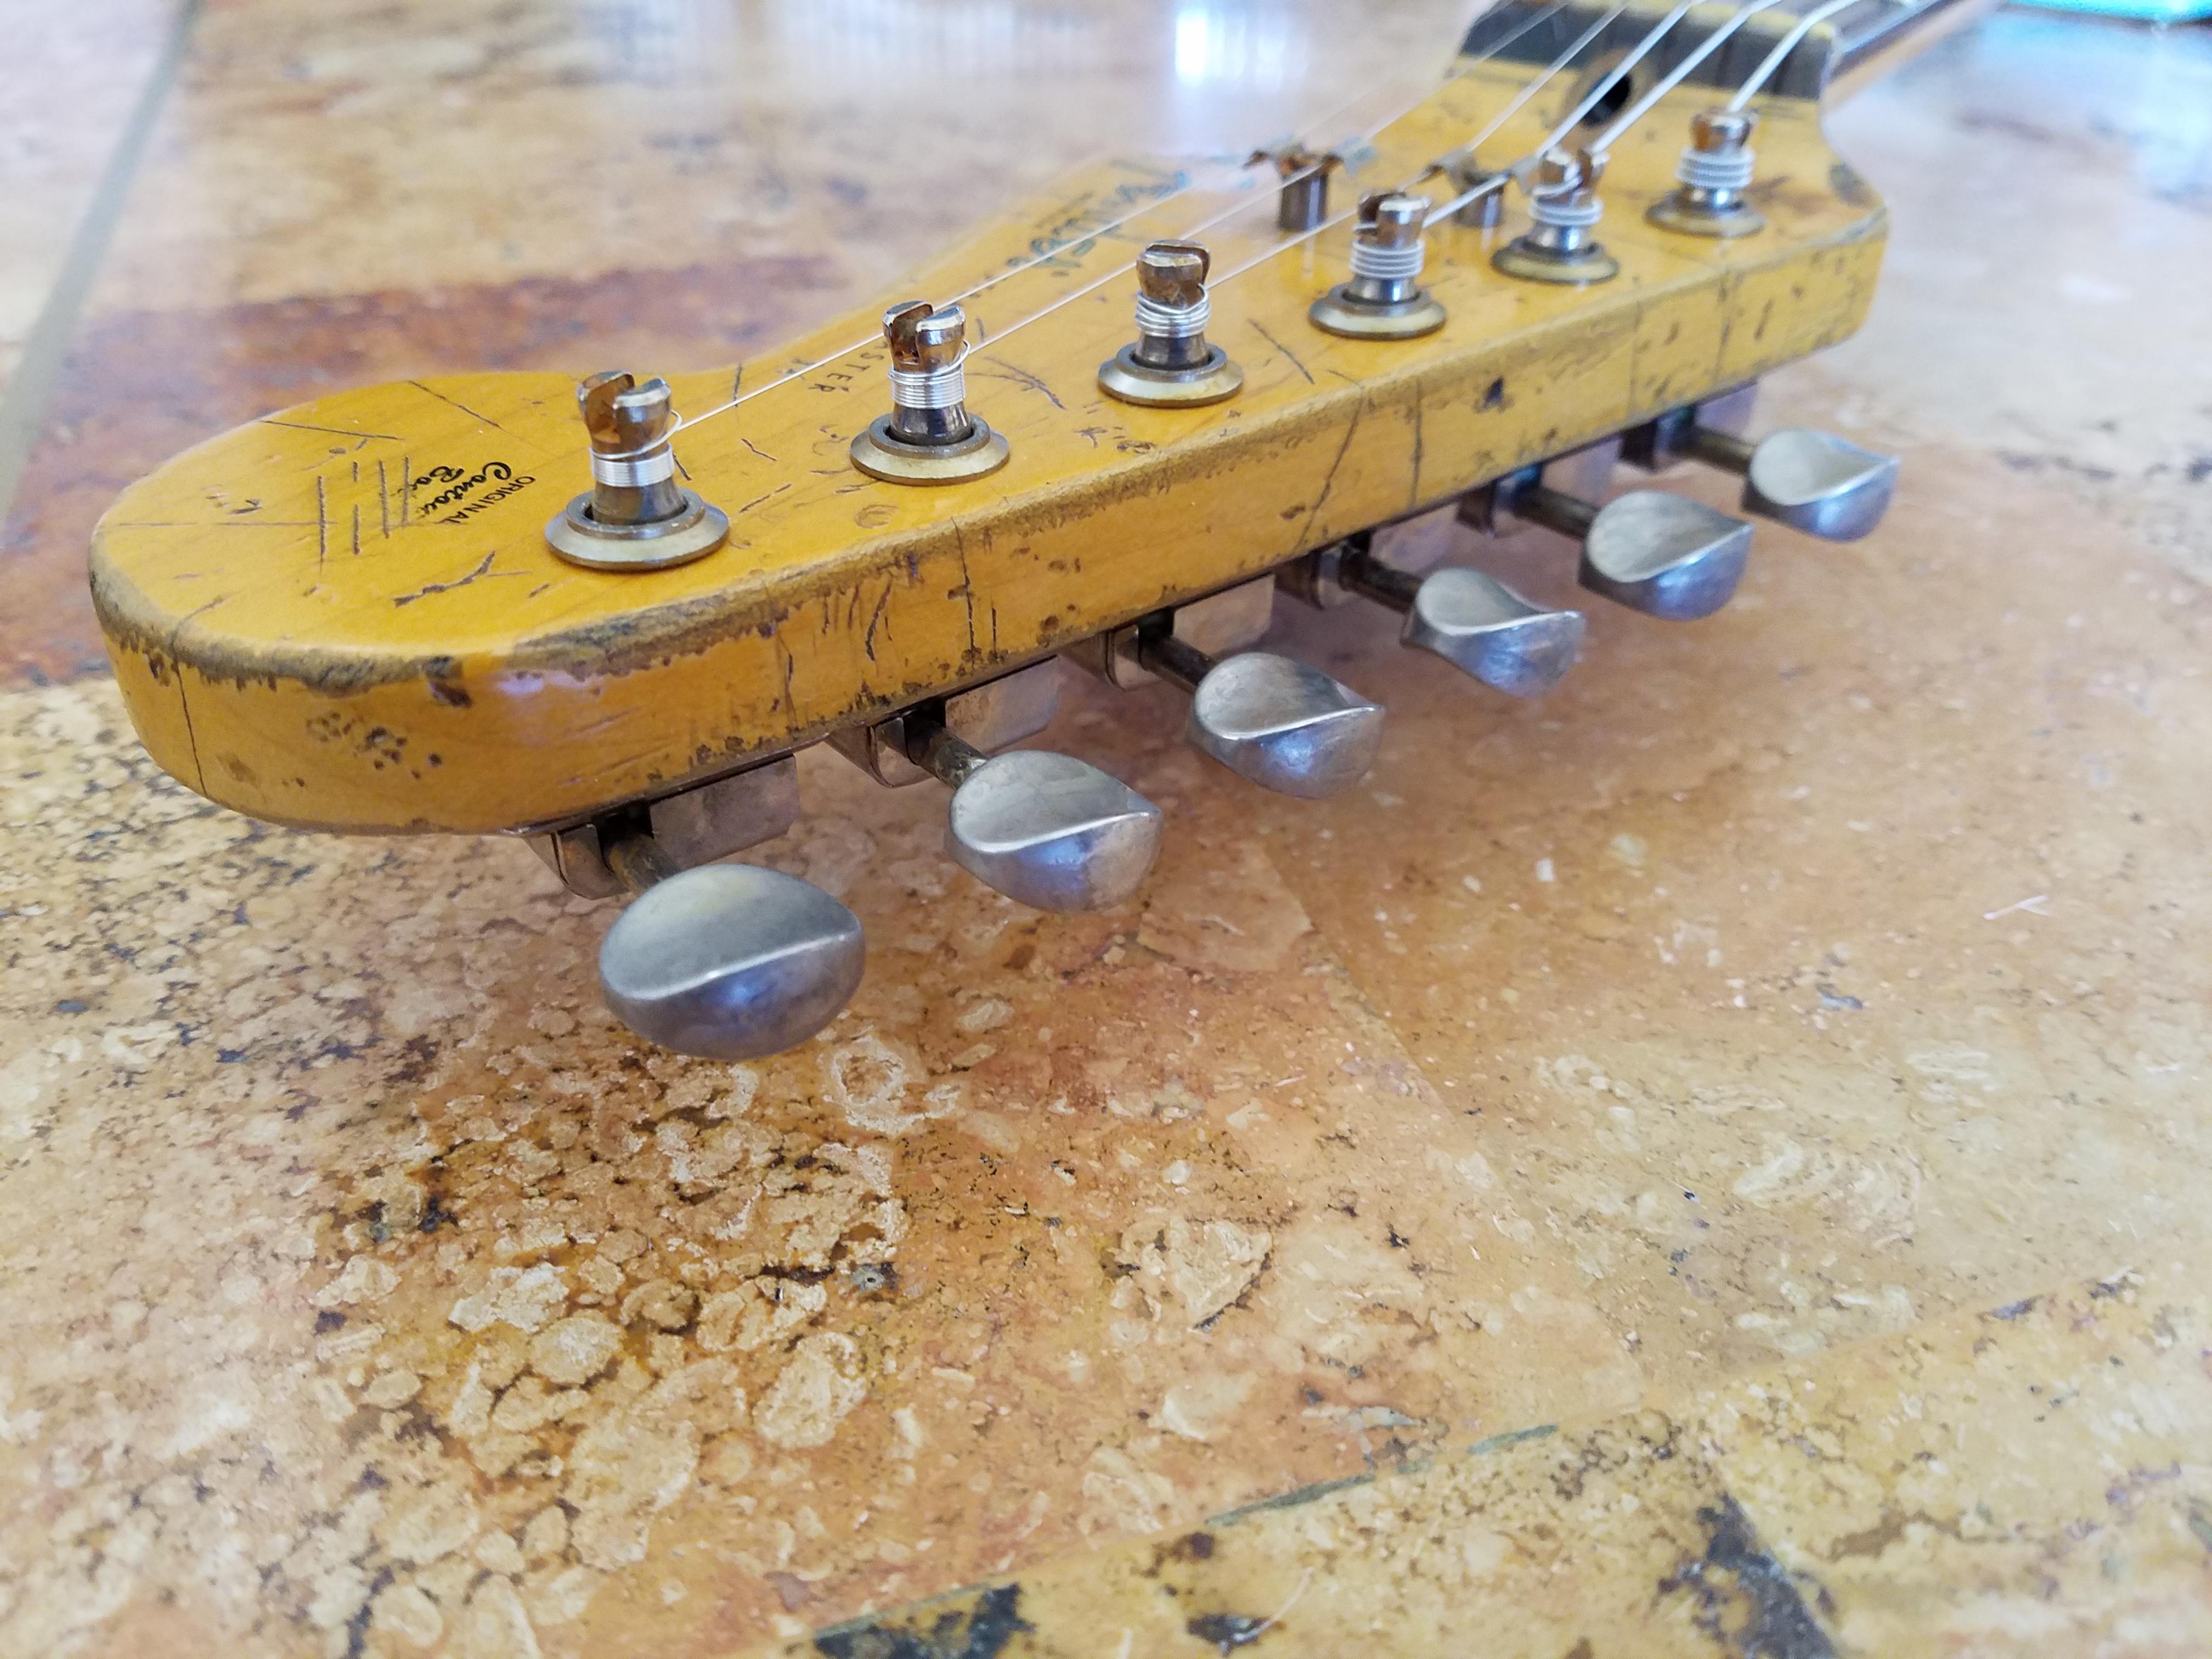 Aged Fender Strat Headstock Relic